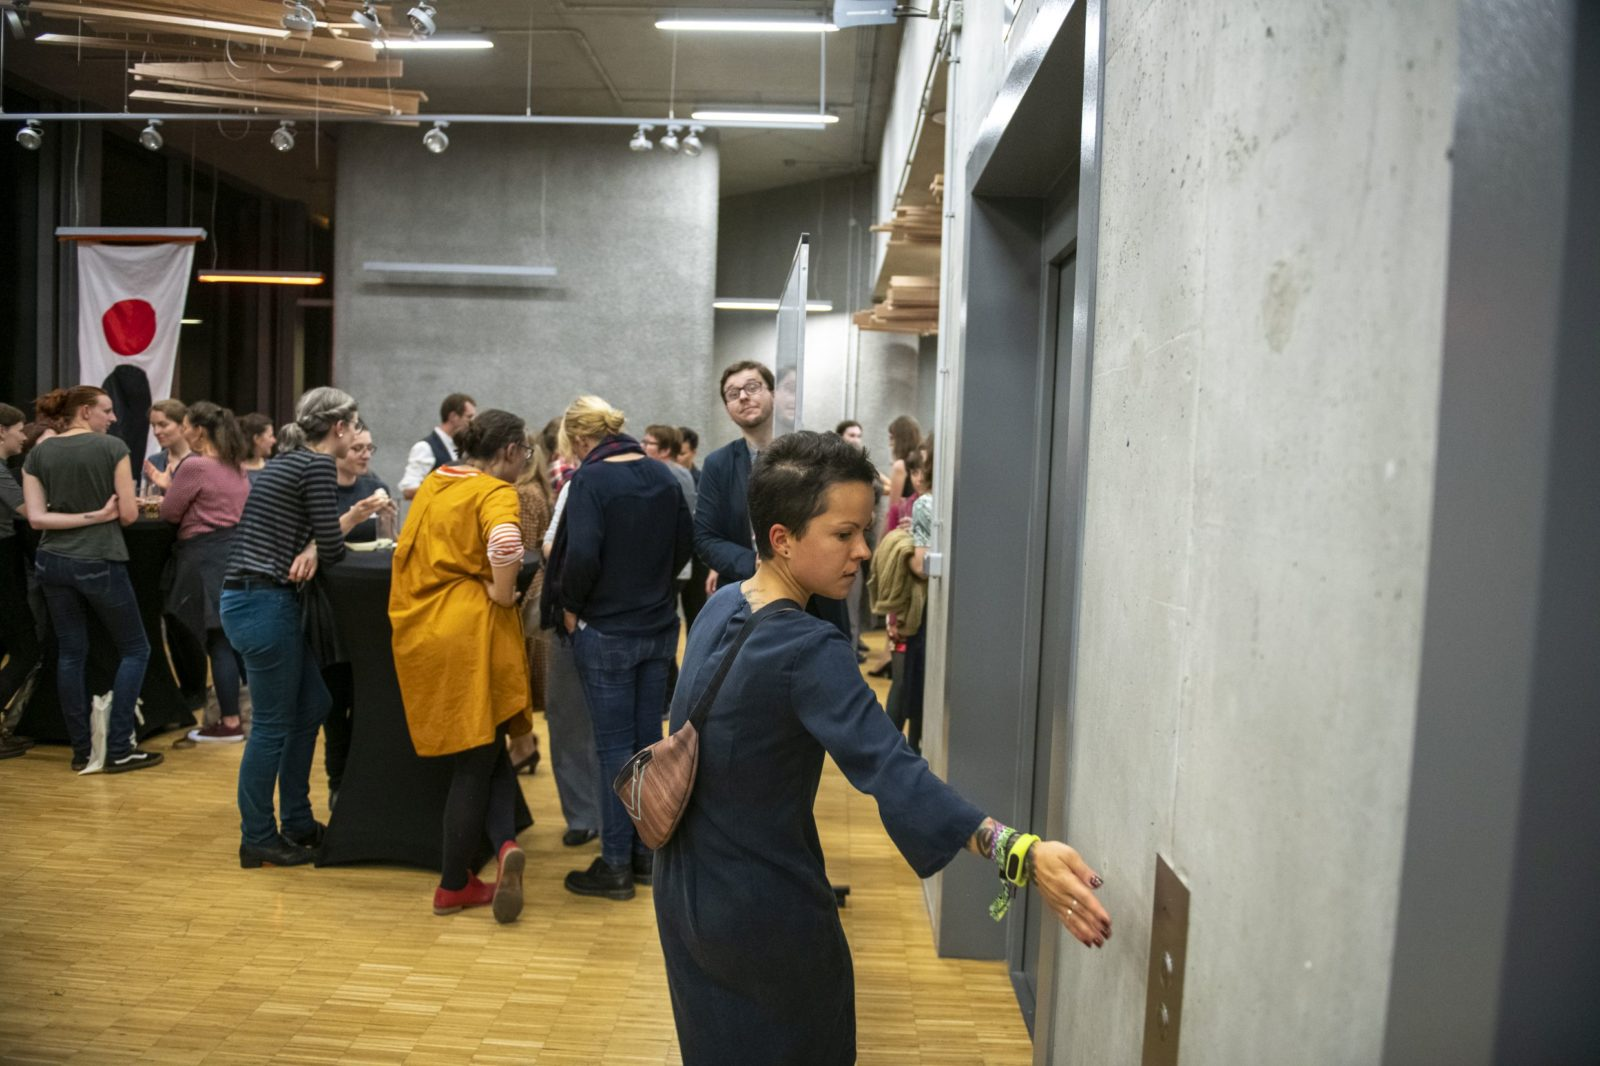 Warschau_2019_Empfang_reception_Thursday_Warsaw_Stasiuk_Konrad_105